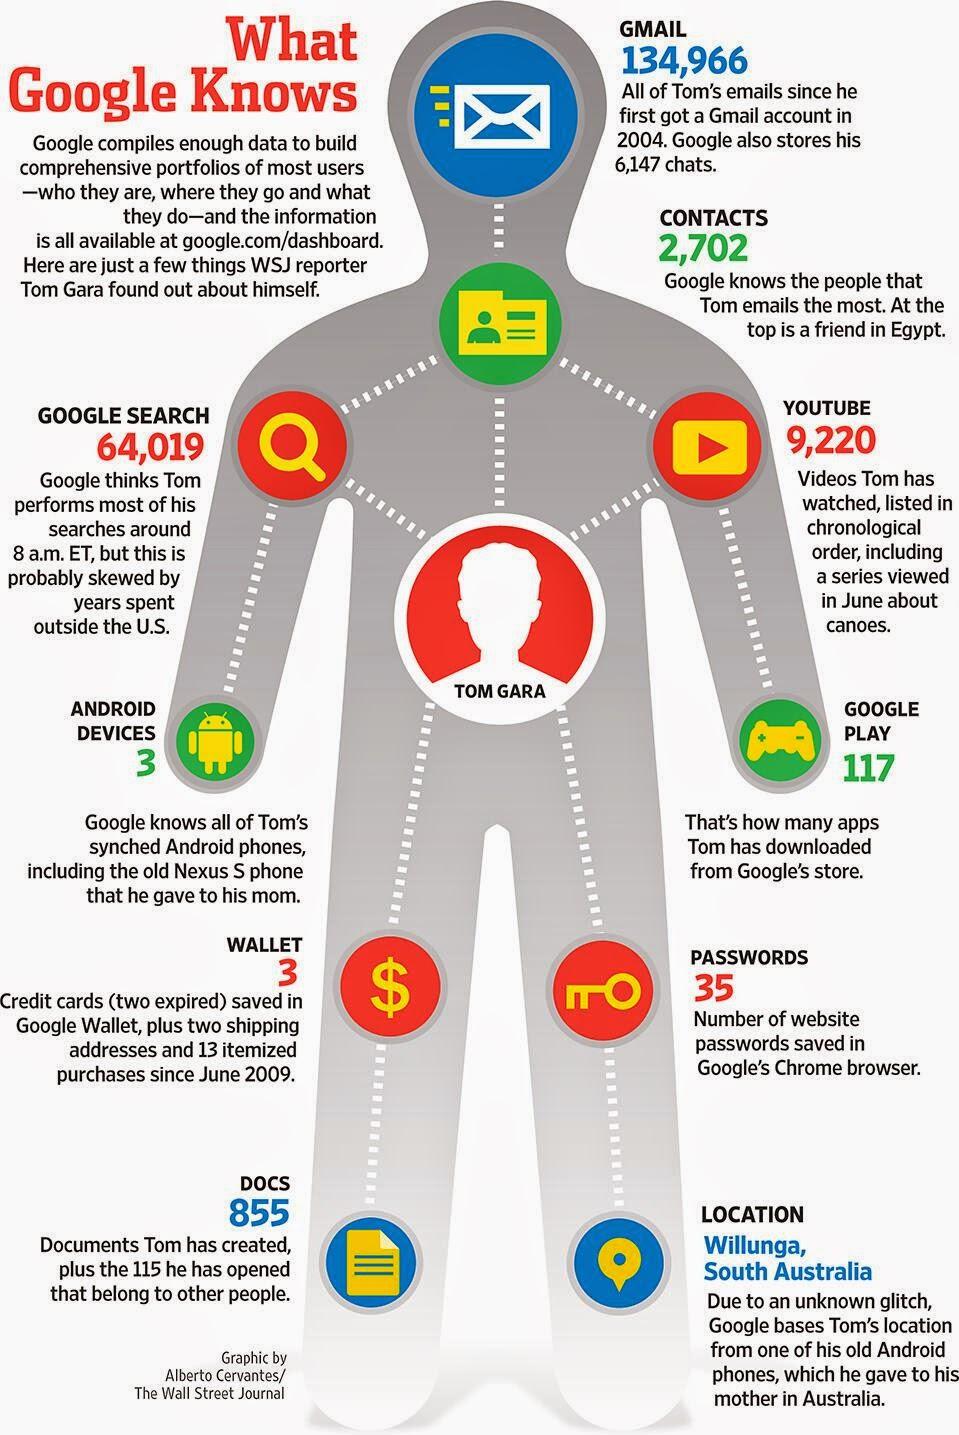 Dutchuncle Nsa Google Online Snooping Goes Beyond Big